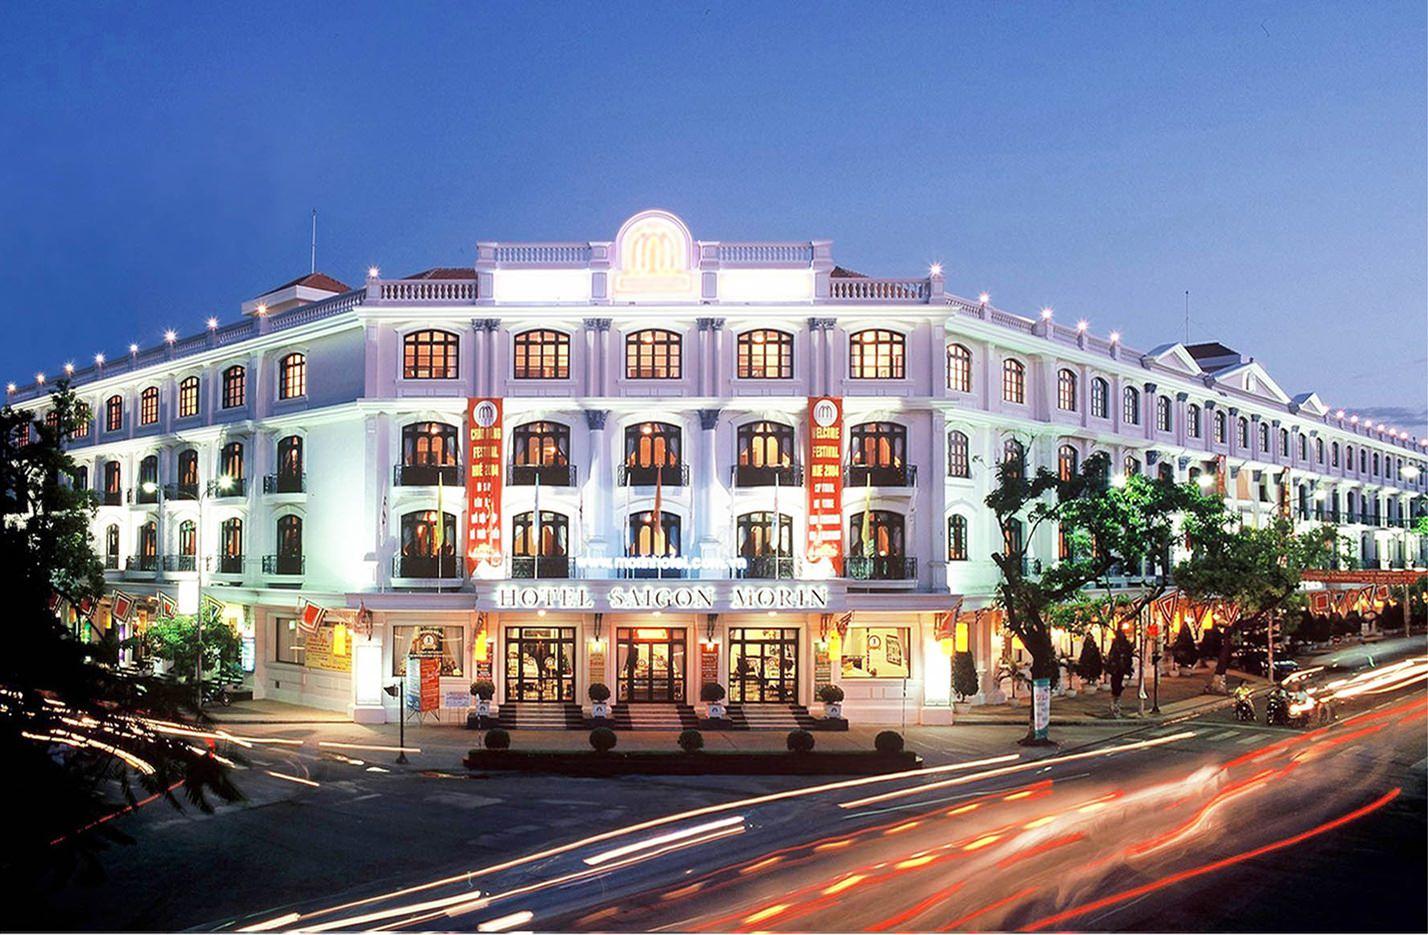 Ultimate List of Backpacker Hotels in Vietnam Hue Hotel Saigon Morin